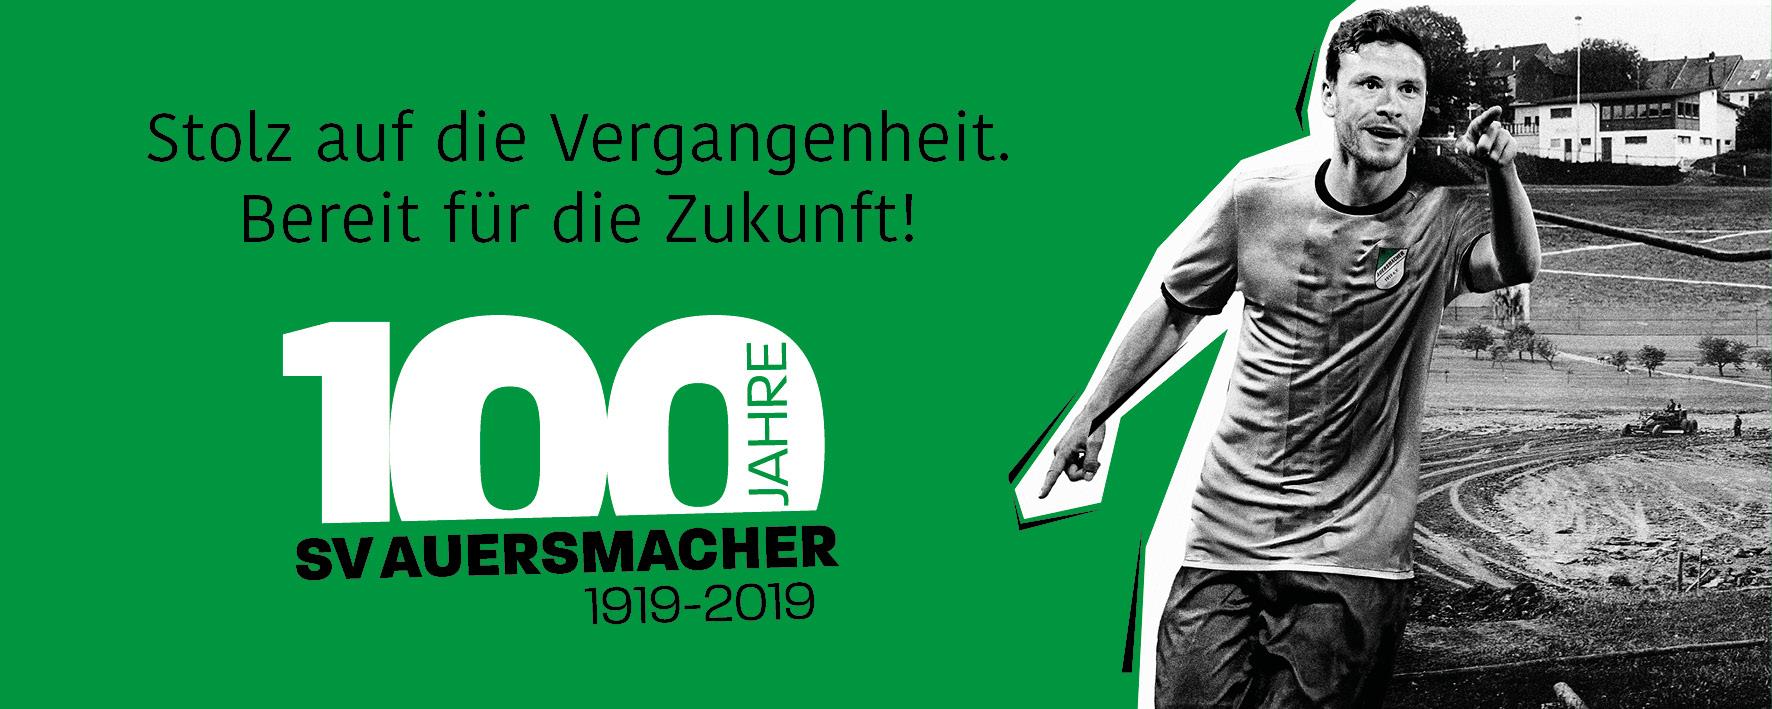 https://sv-auersmacher.de/wp-content/uploads/2019/01/Banner-100Jahre-300x120mm.jpg